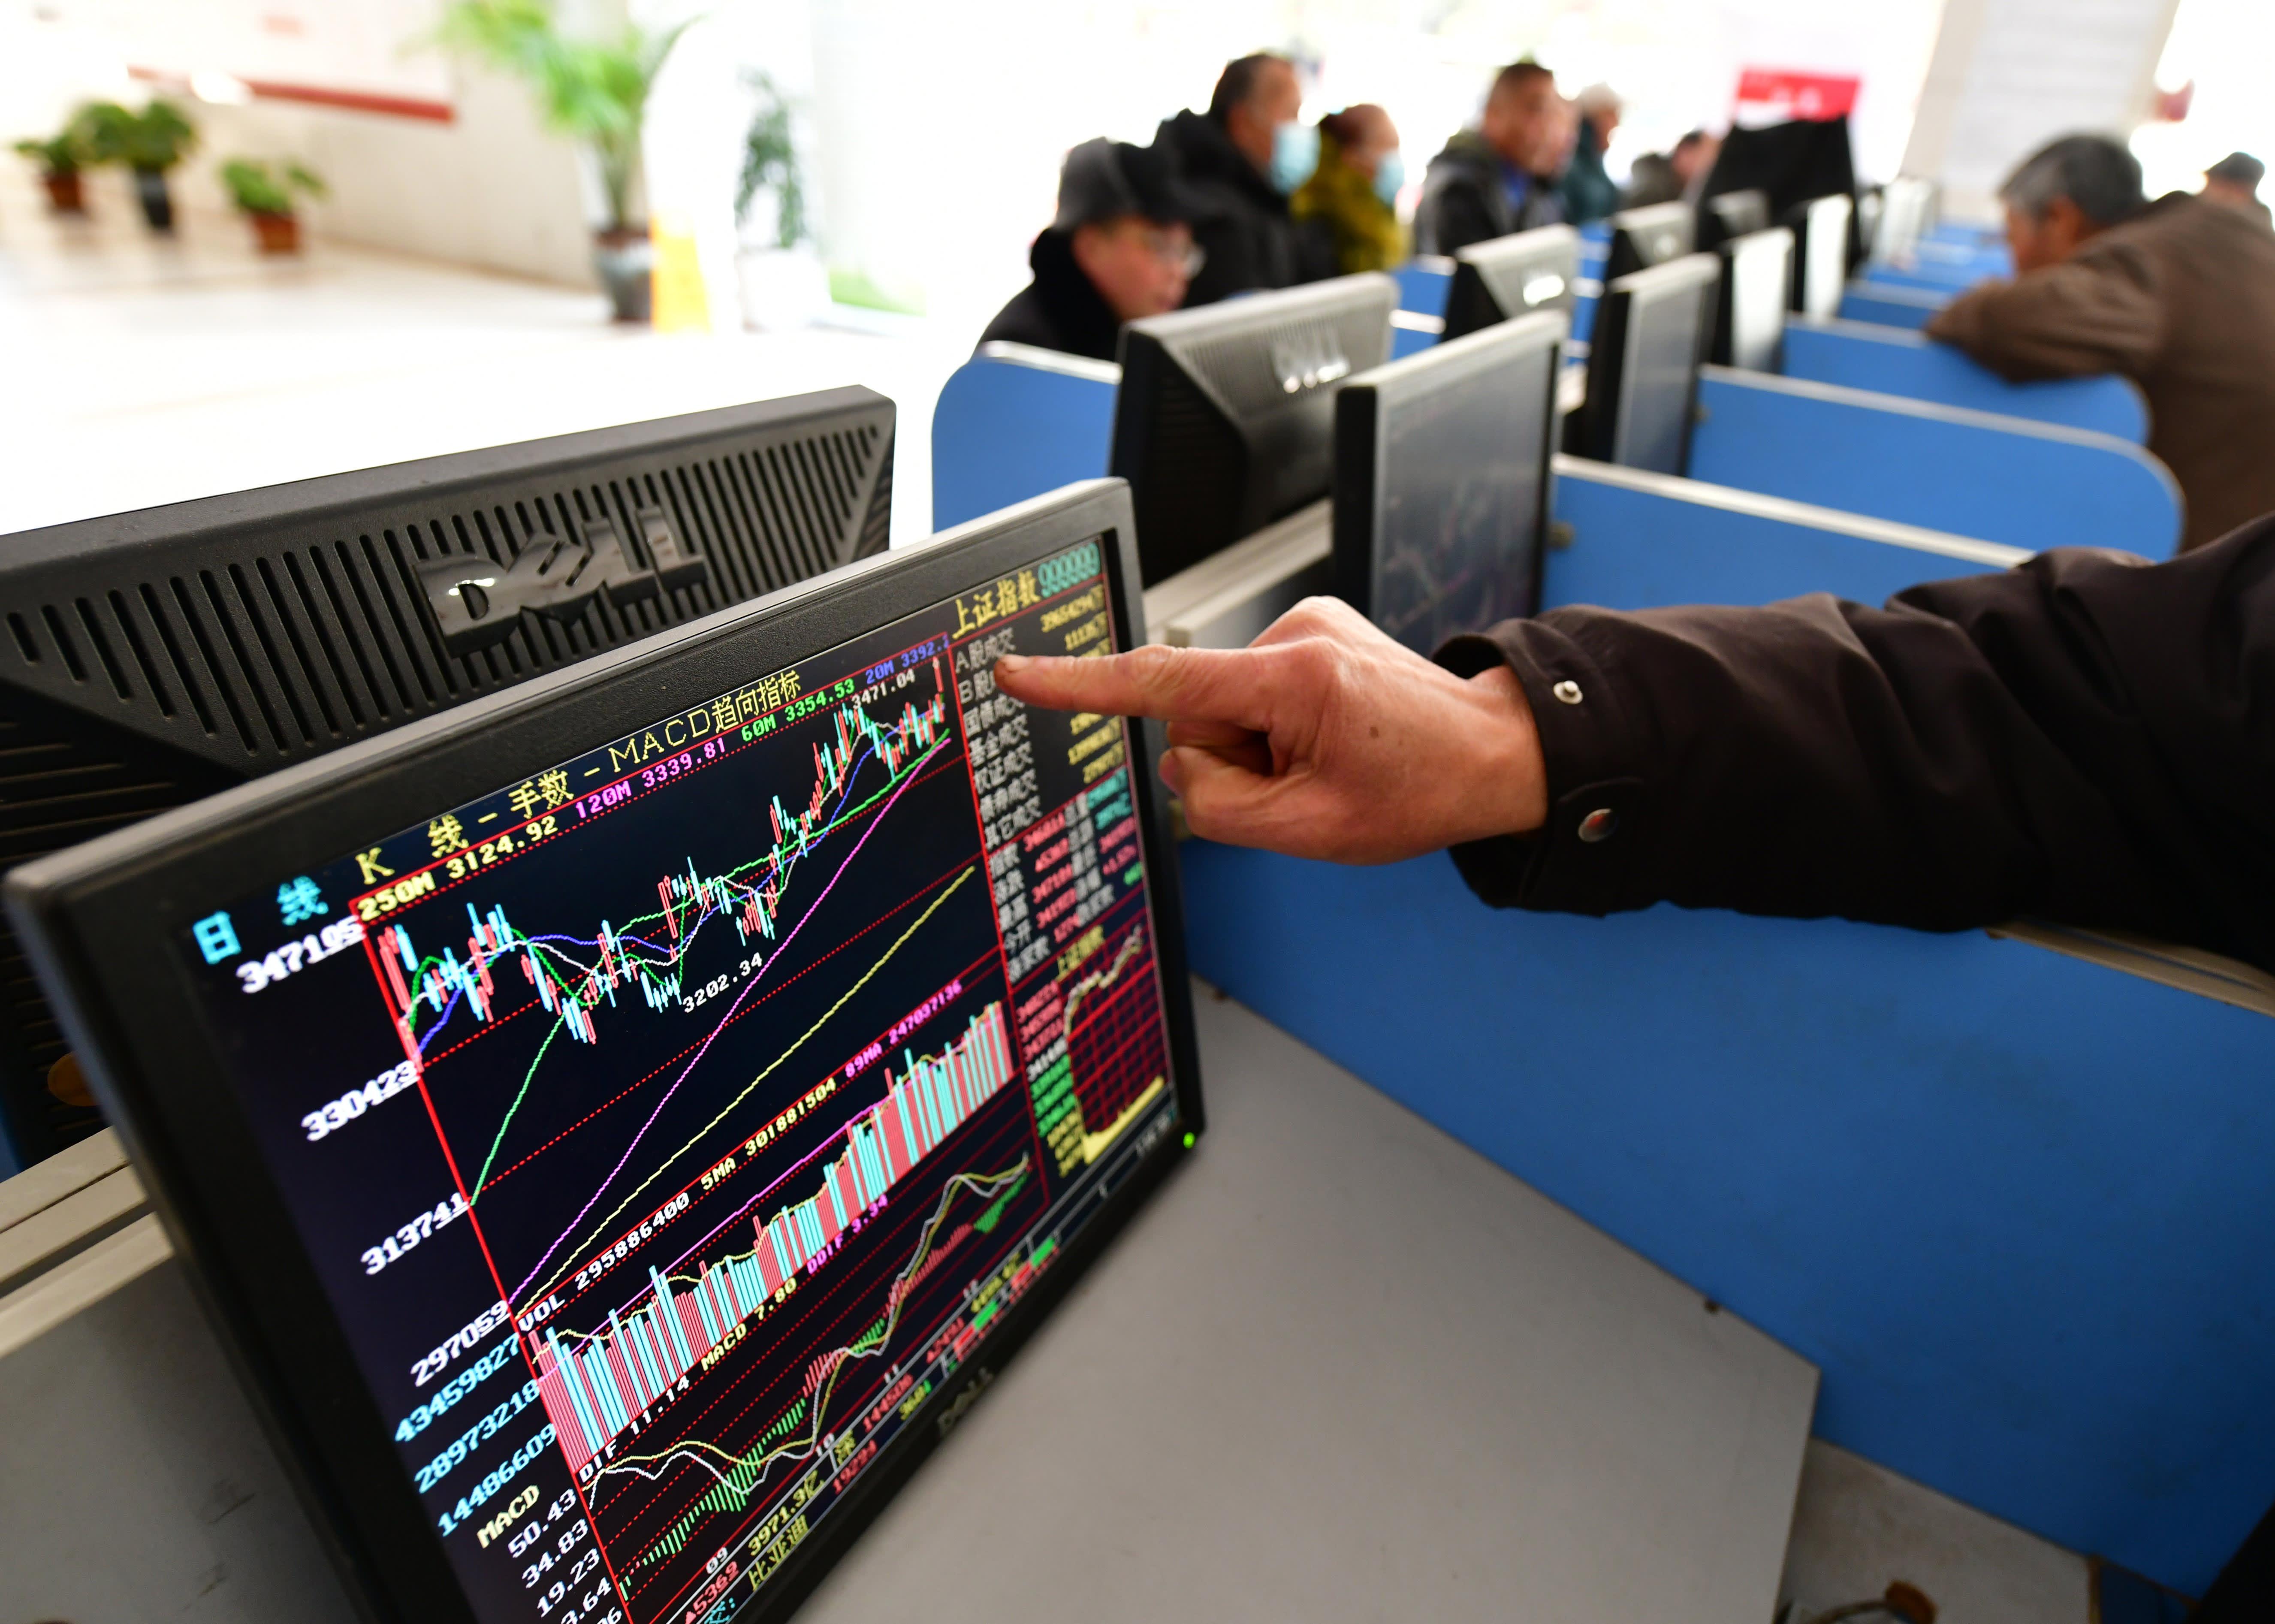 China may be cracking down, but investors put $3.6 billion into Chinese stocks last week